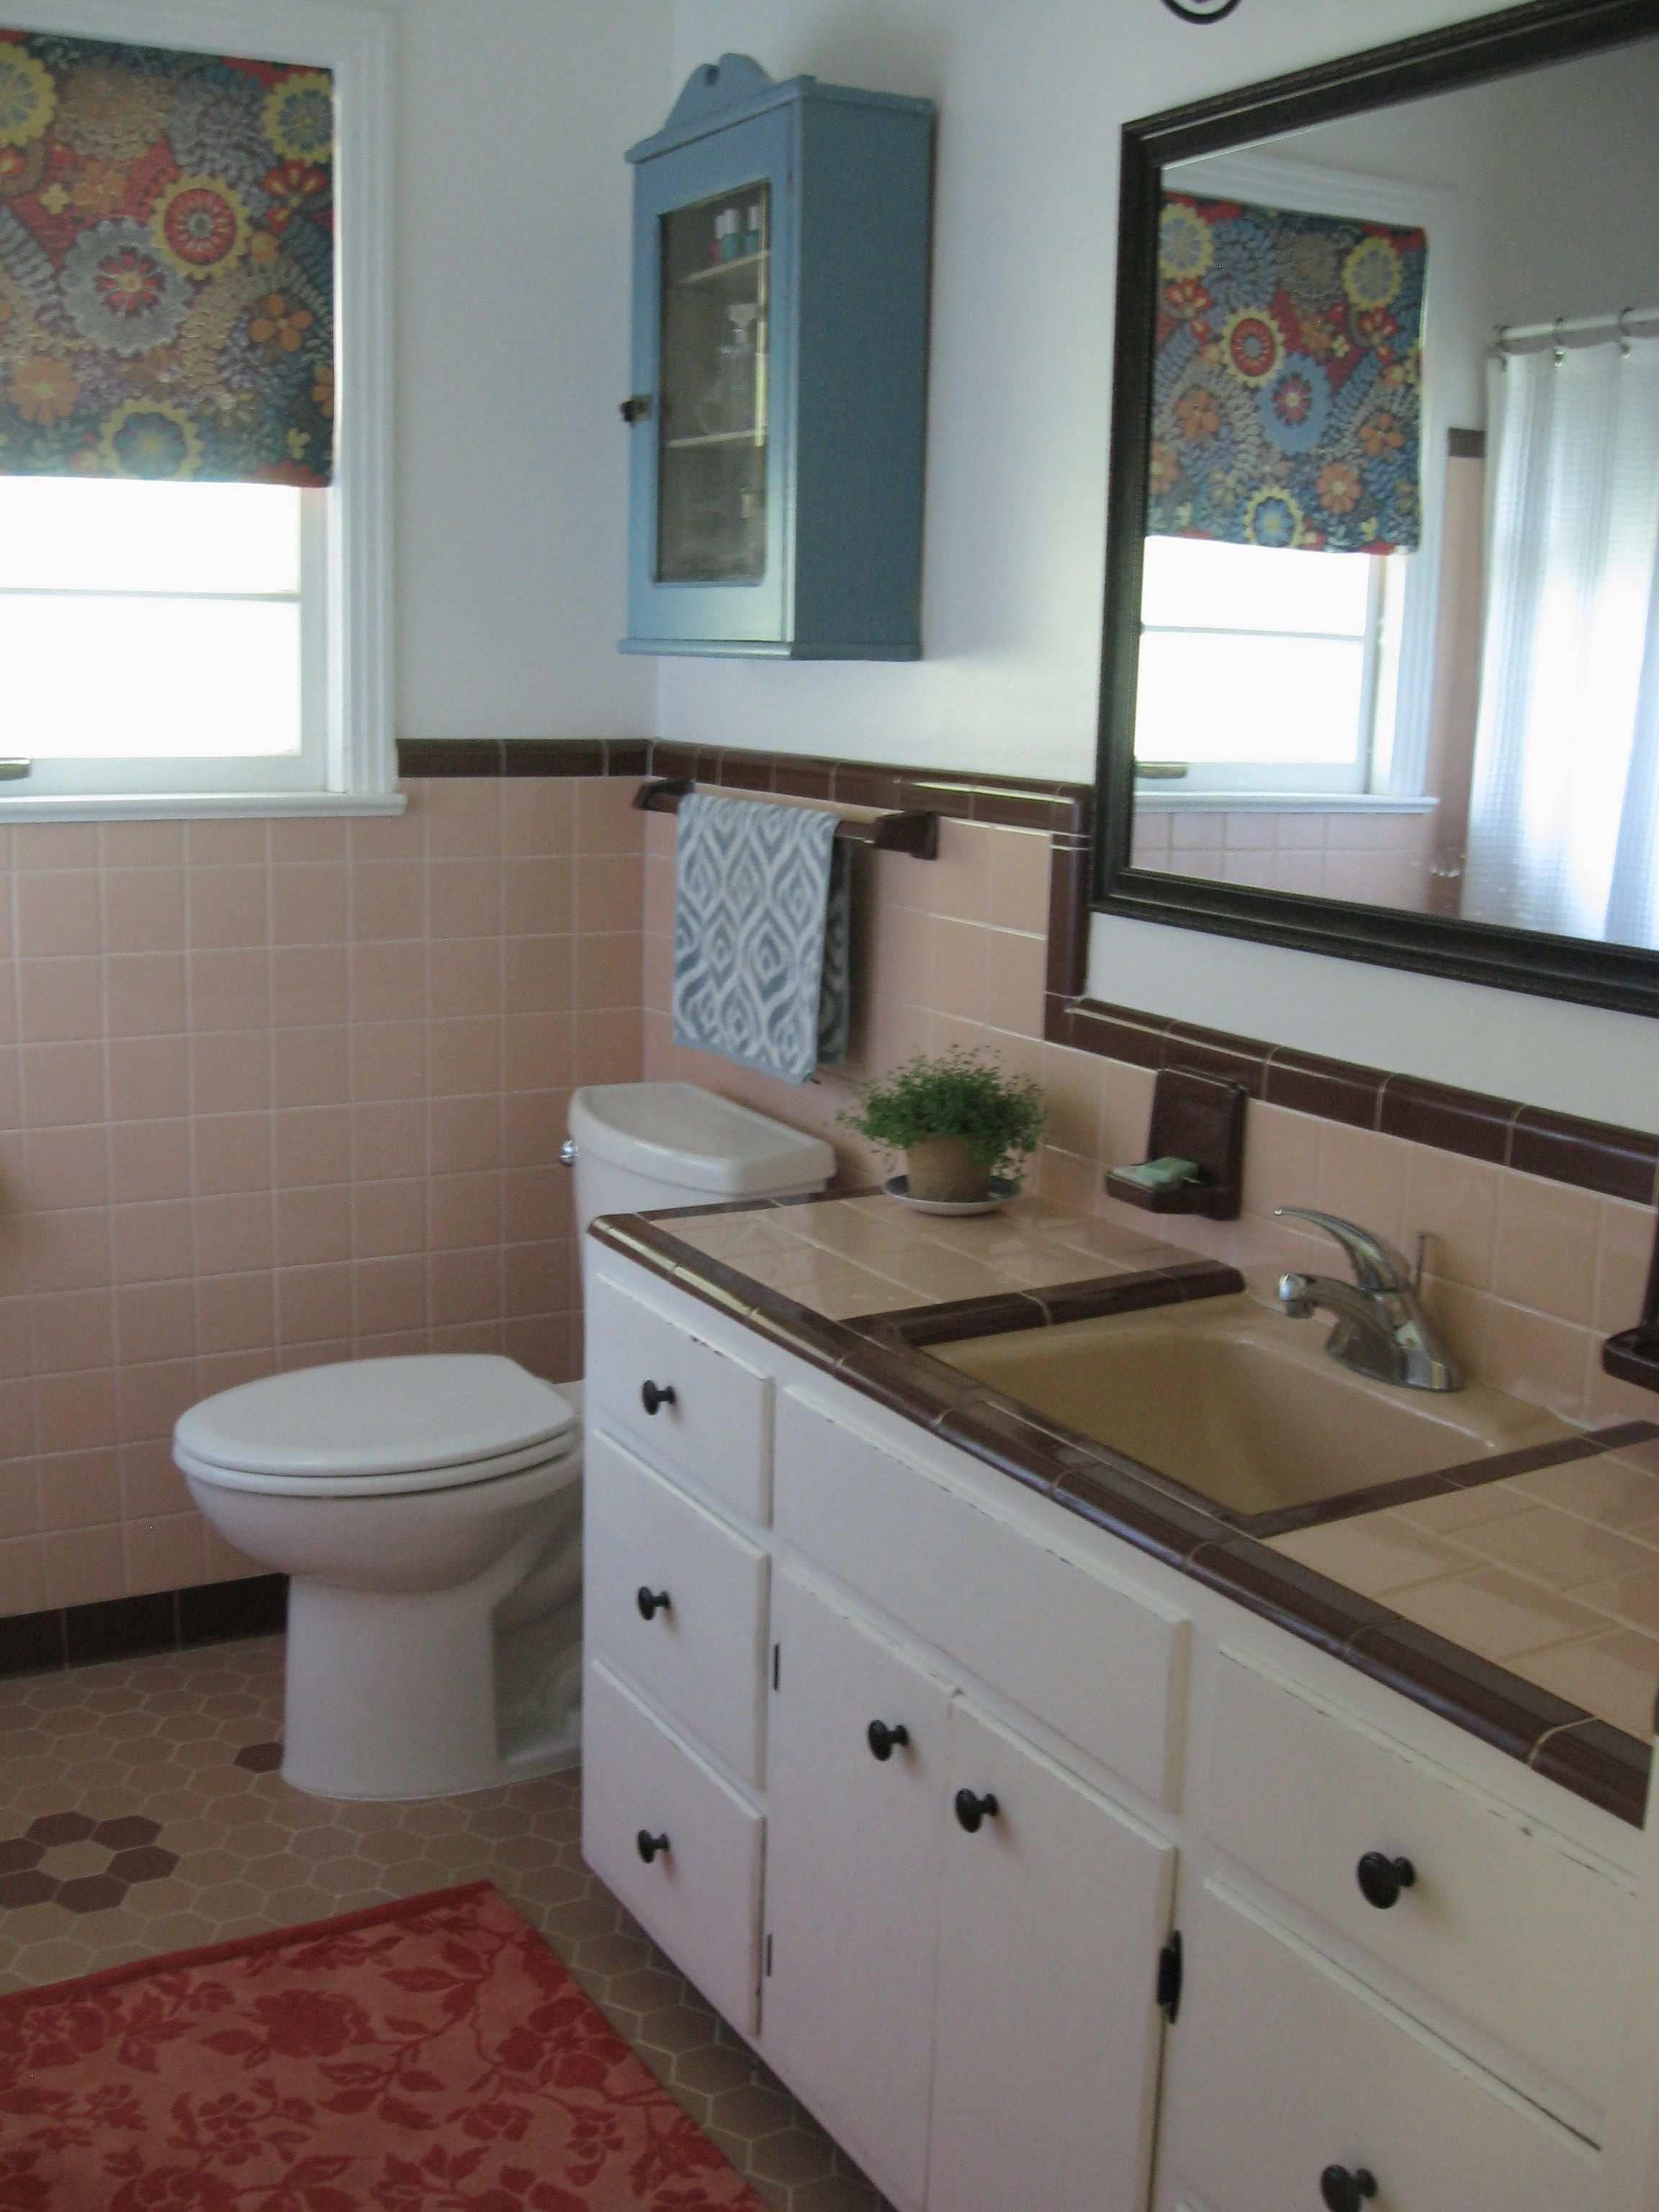 Retro Bathroom 50s Bathroom Peach Tile With Reddish Brown Trim